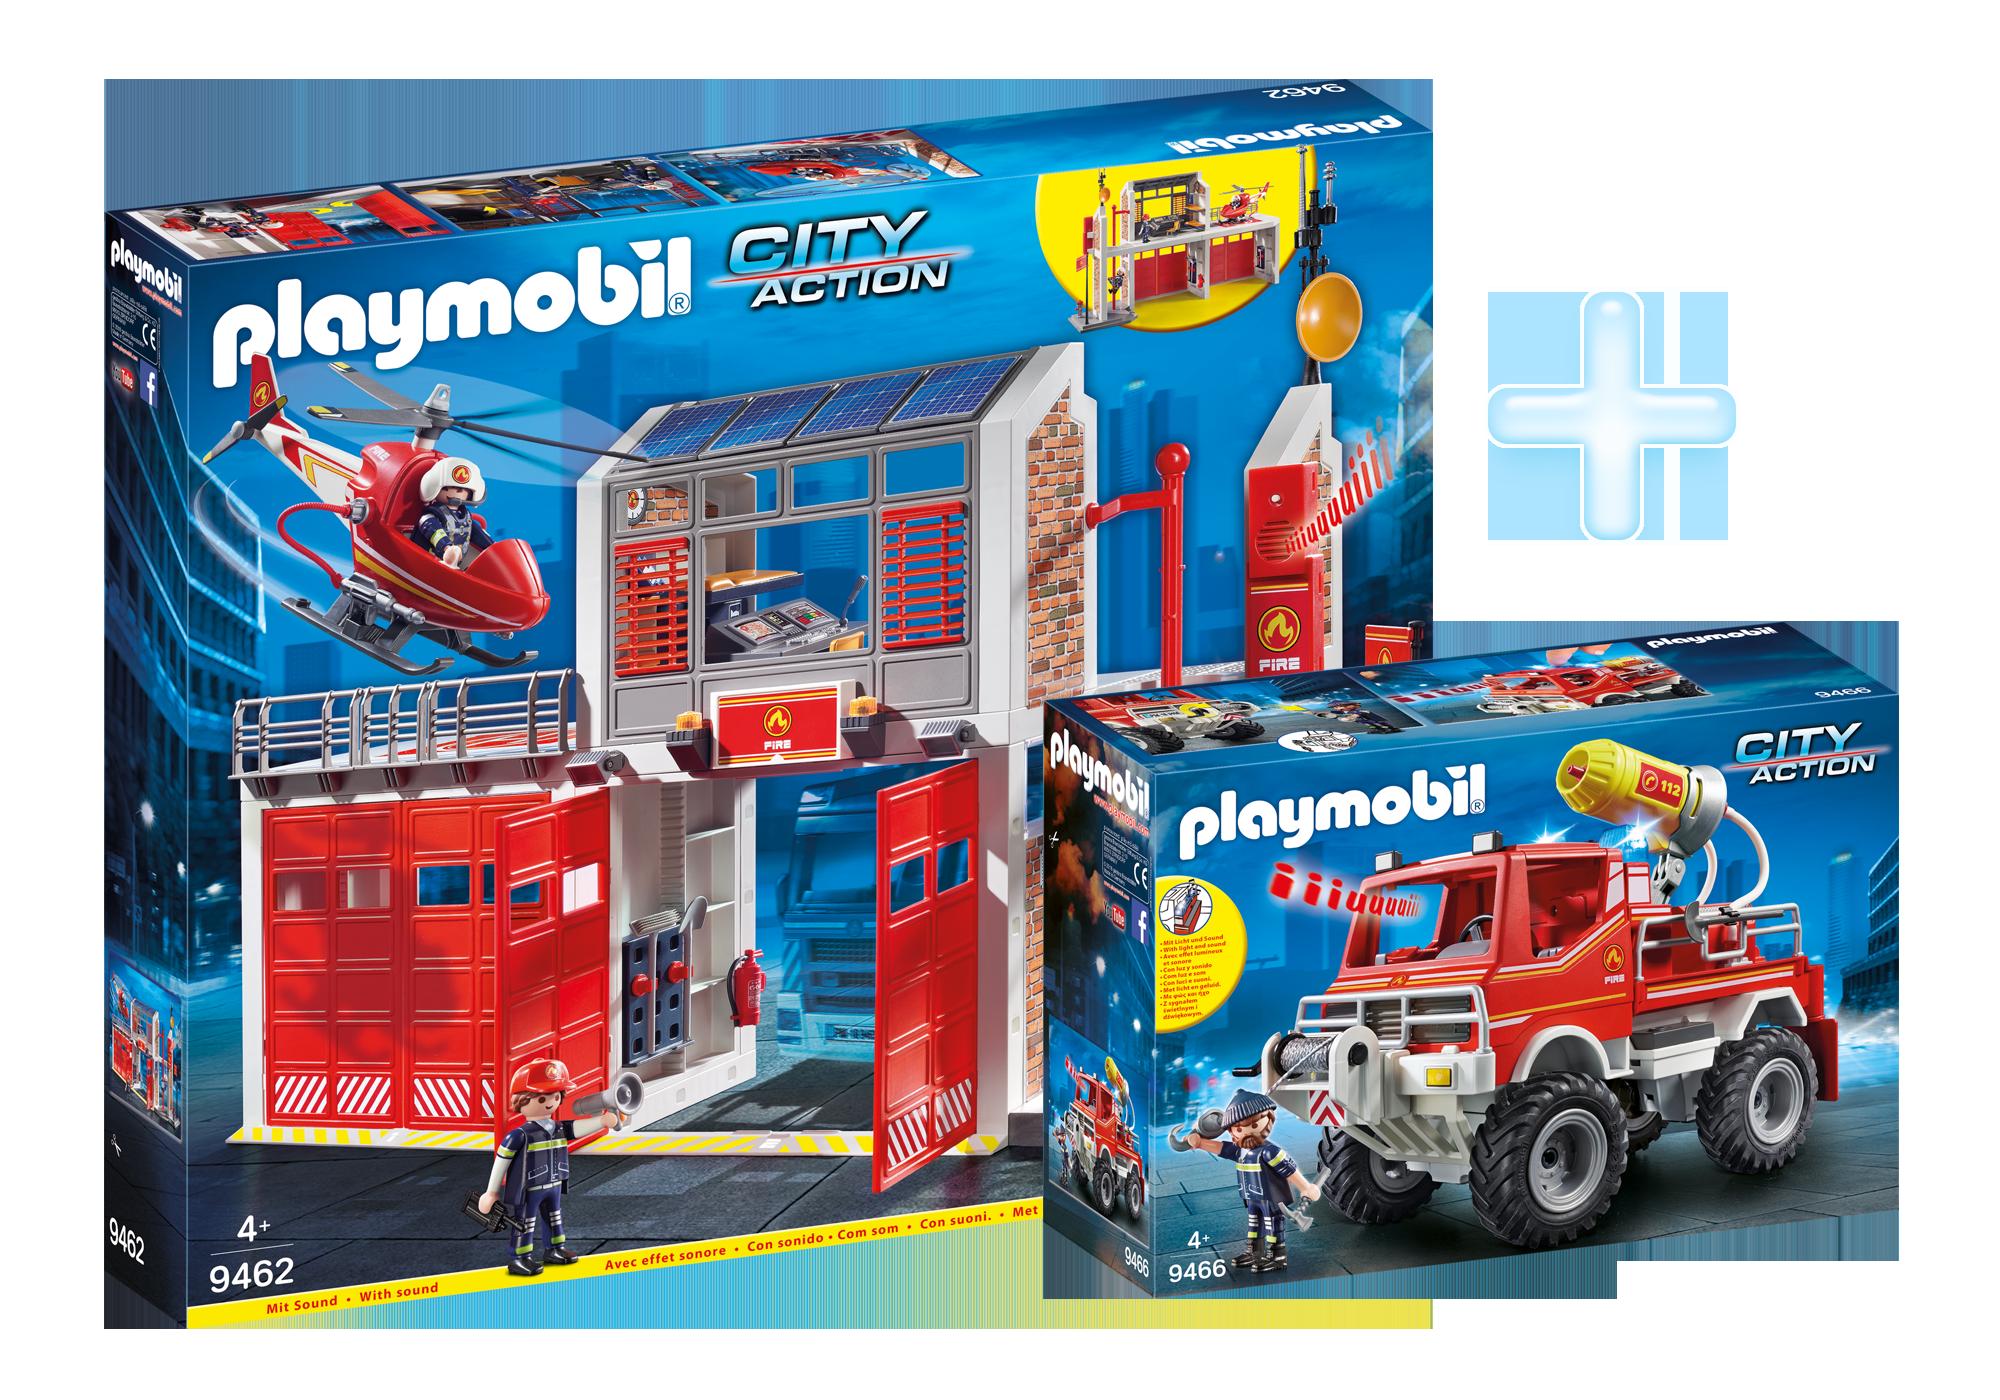 http://media.playmobil.com/i/playmobil/DE1812H_product_detail